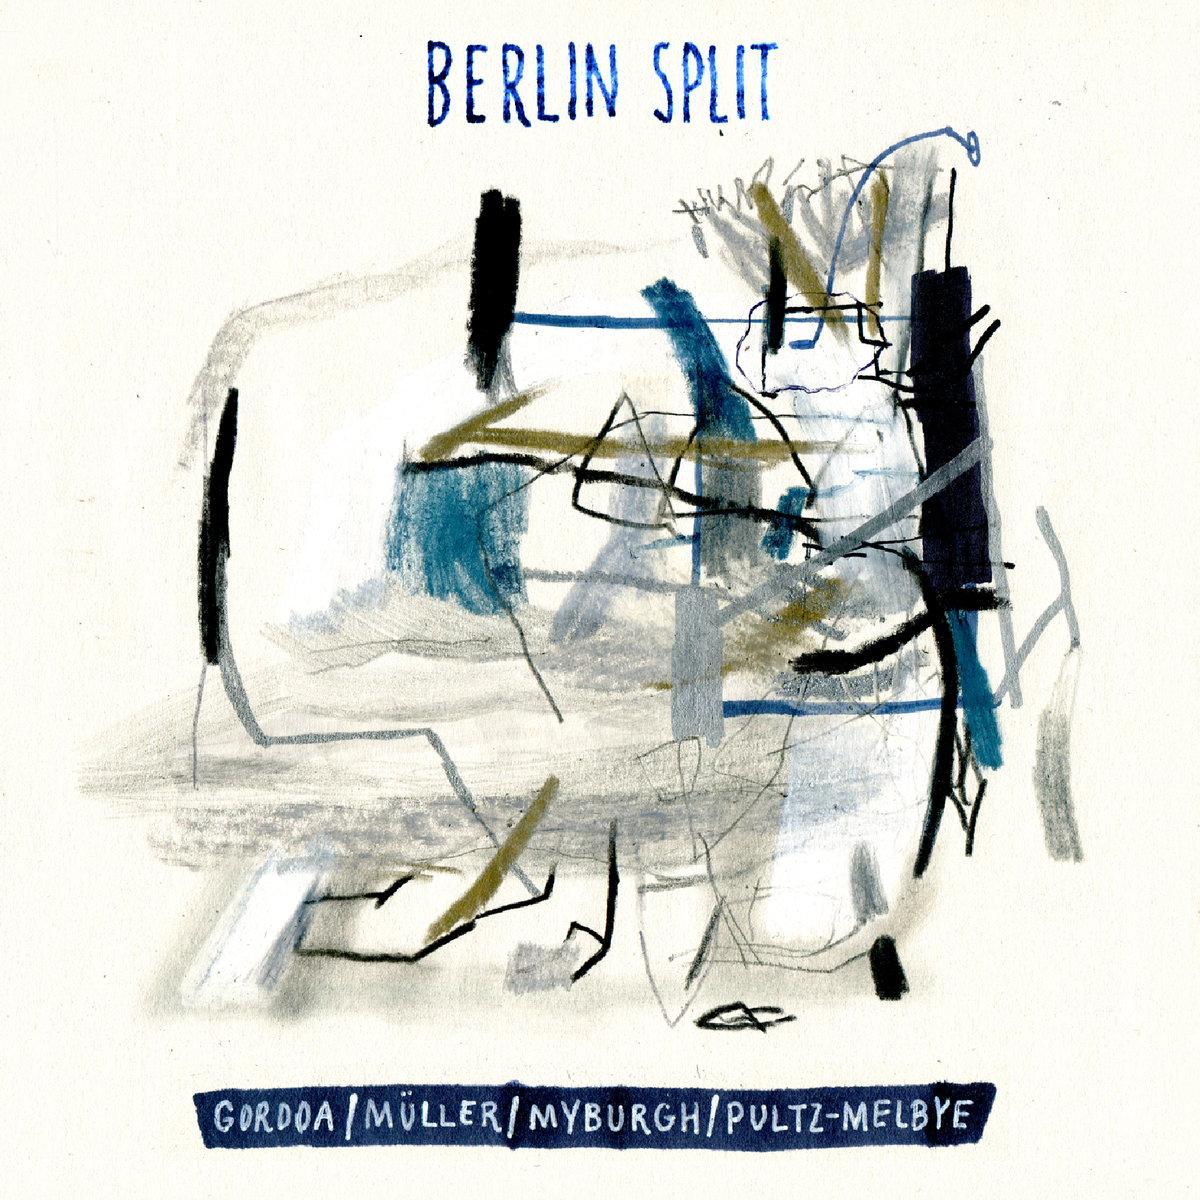 Berlin Split   Emilio Gordoa, Matthias Müller, Josten Myburgh & Adam Pultz-Melbye